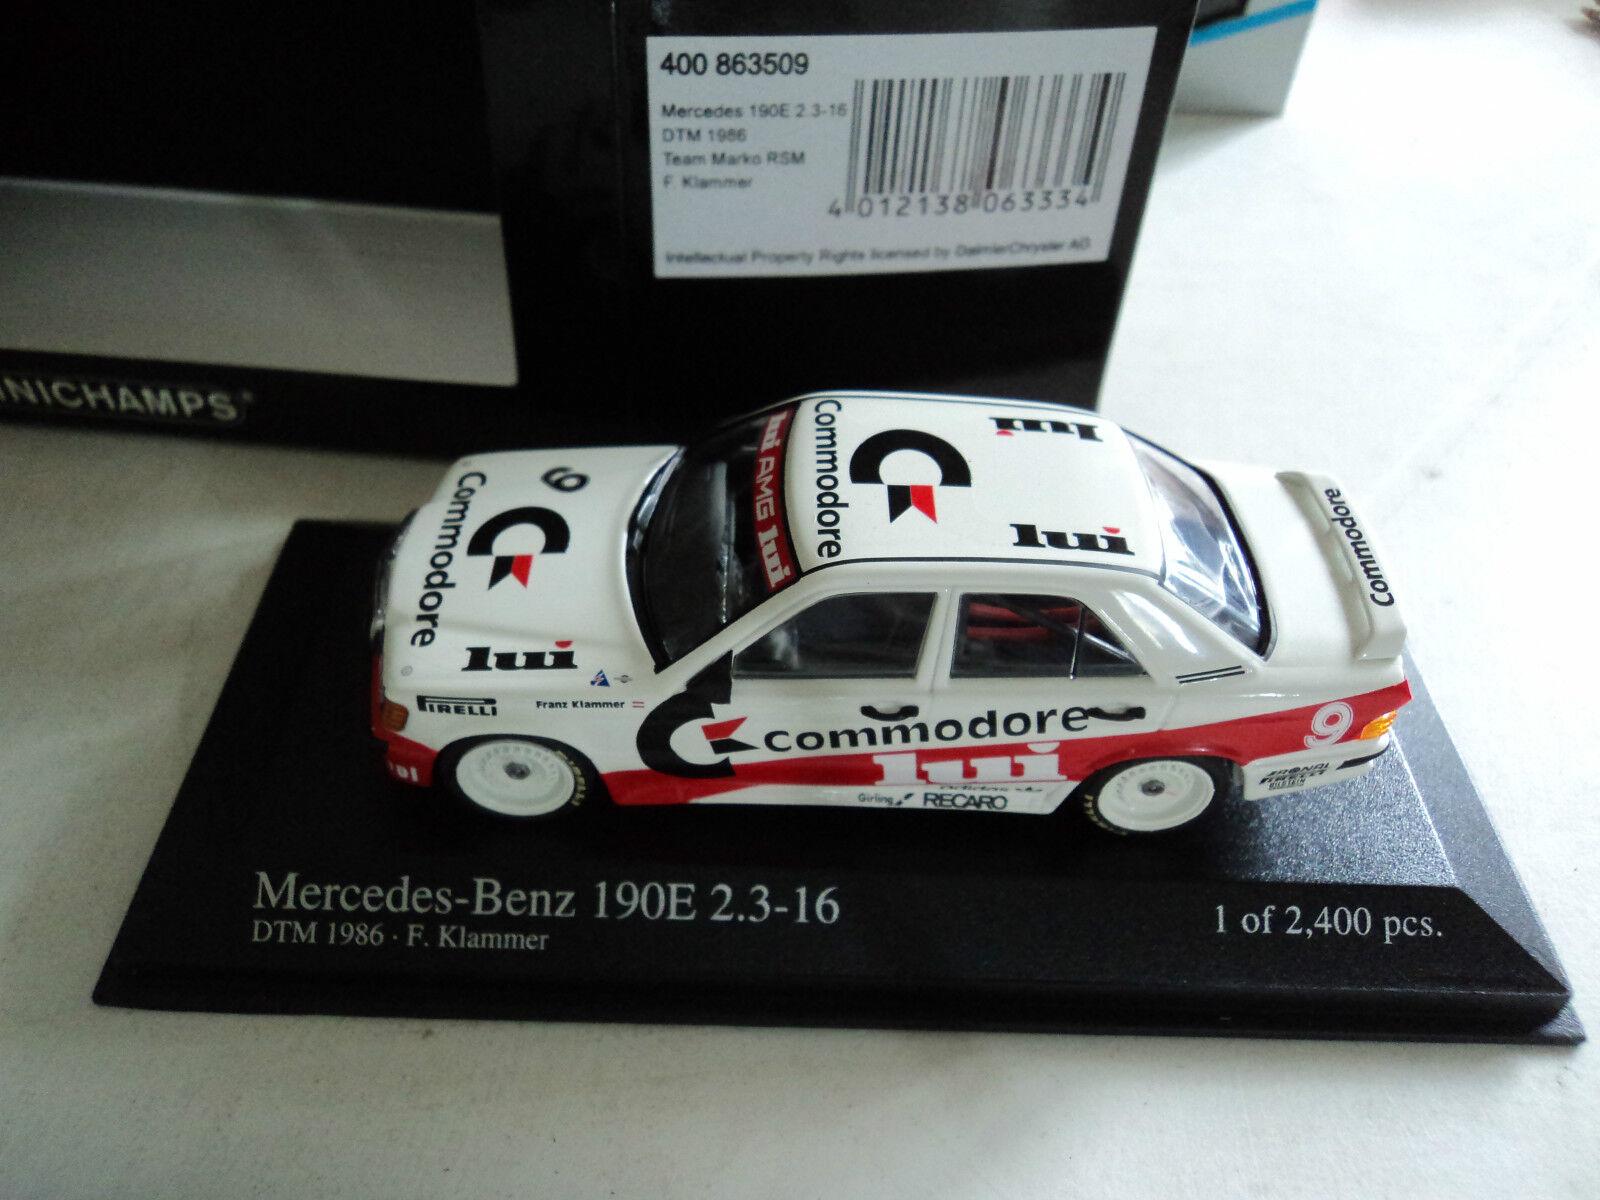 Minichamps 1 43 Mercedes-Benz Mercedes-Benz Mercedes-Benz 190E 2.3-16  9 DTM 1986 F. Klammer 70dc75